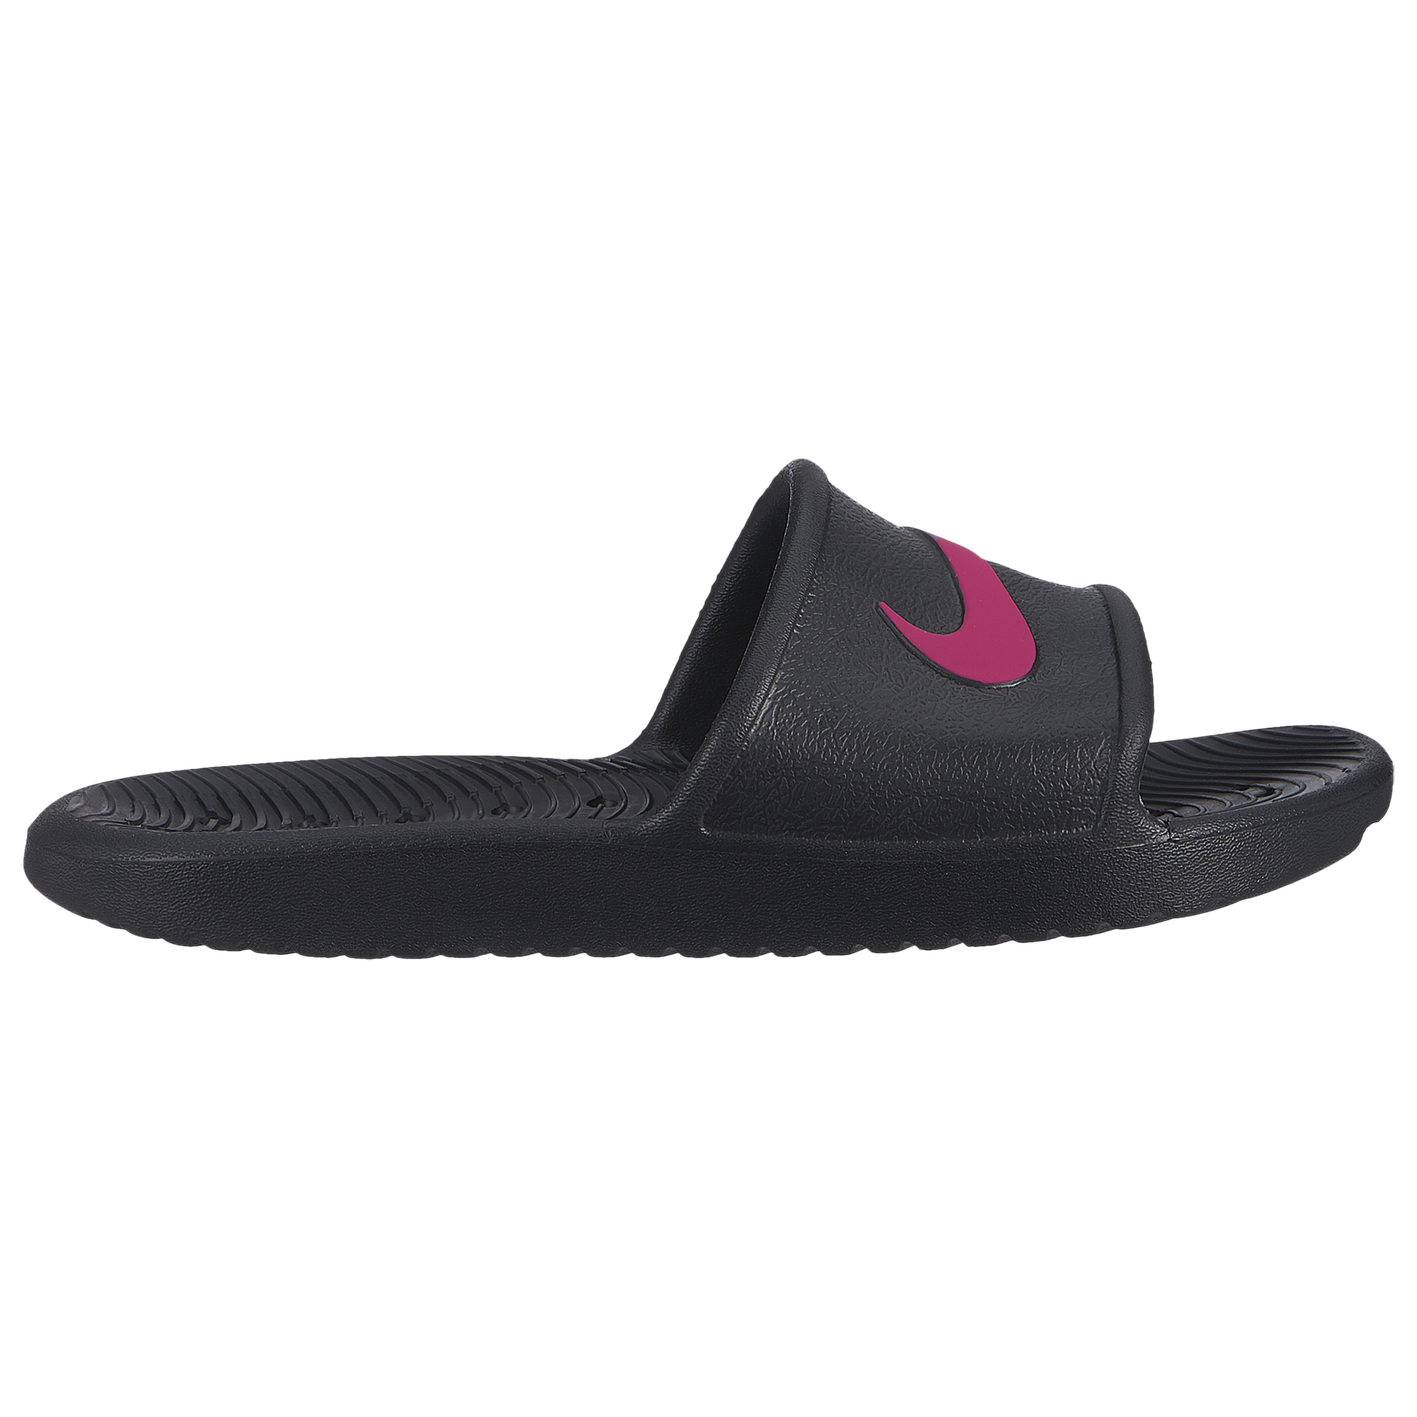 7ab08a3cc297 Nike Kawa Shower Slide - Girls  Grade School - Casual - Shoes ...